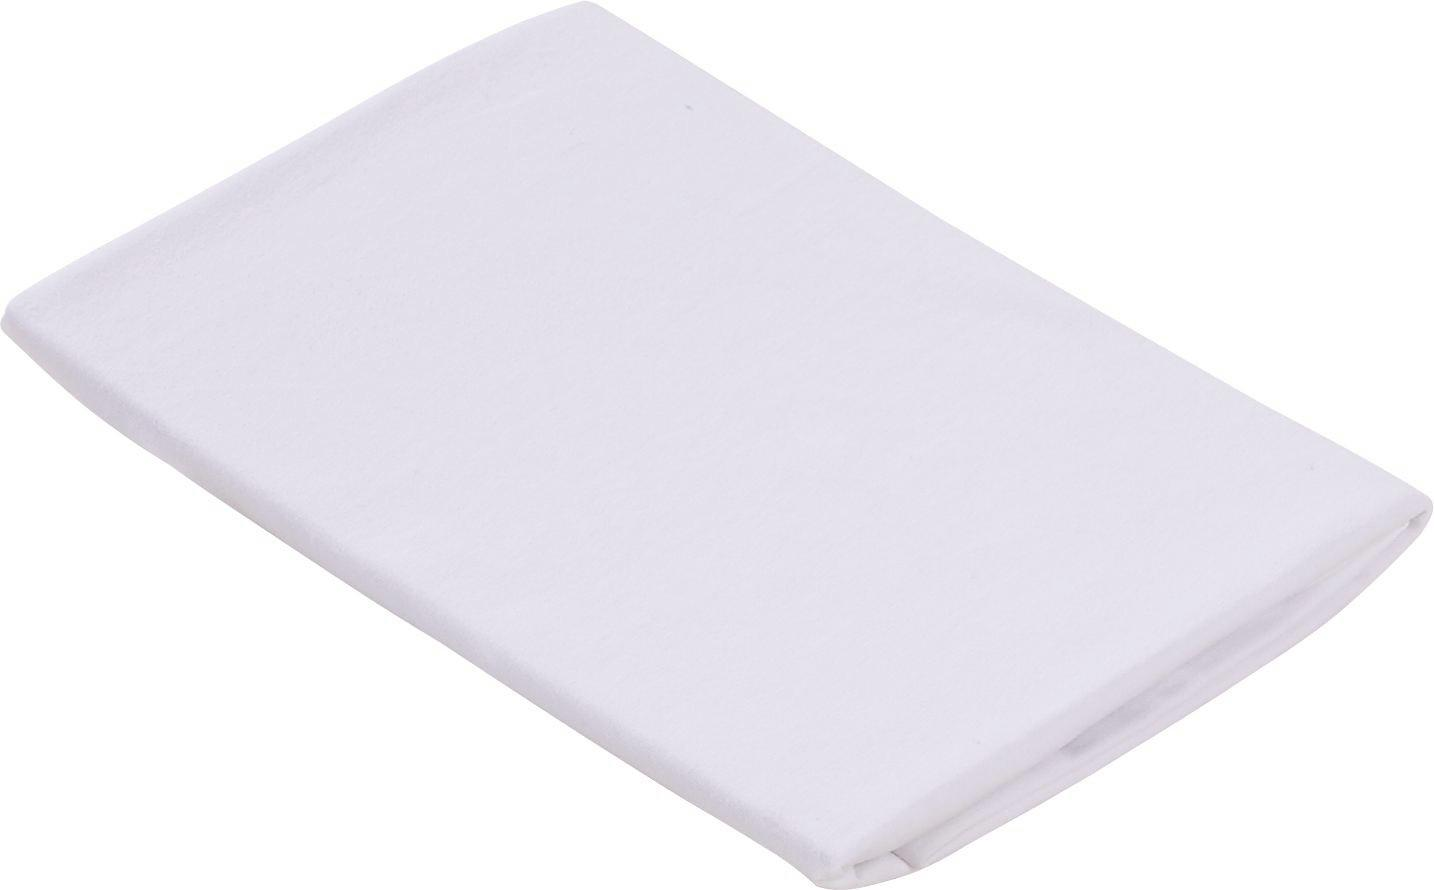 Povlak Na Polštář Basic - bílá, textil (40/80cm) - MÖMAX modern living